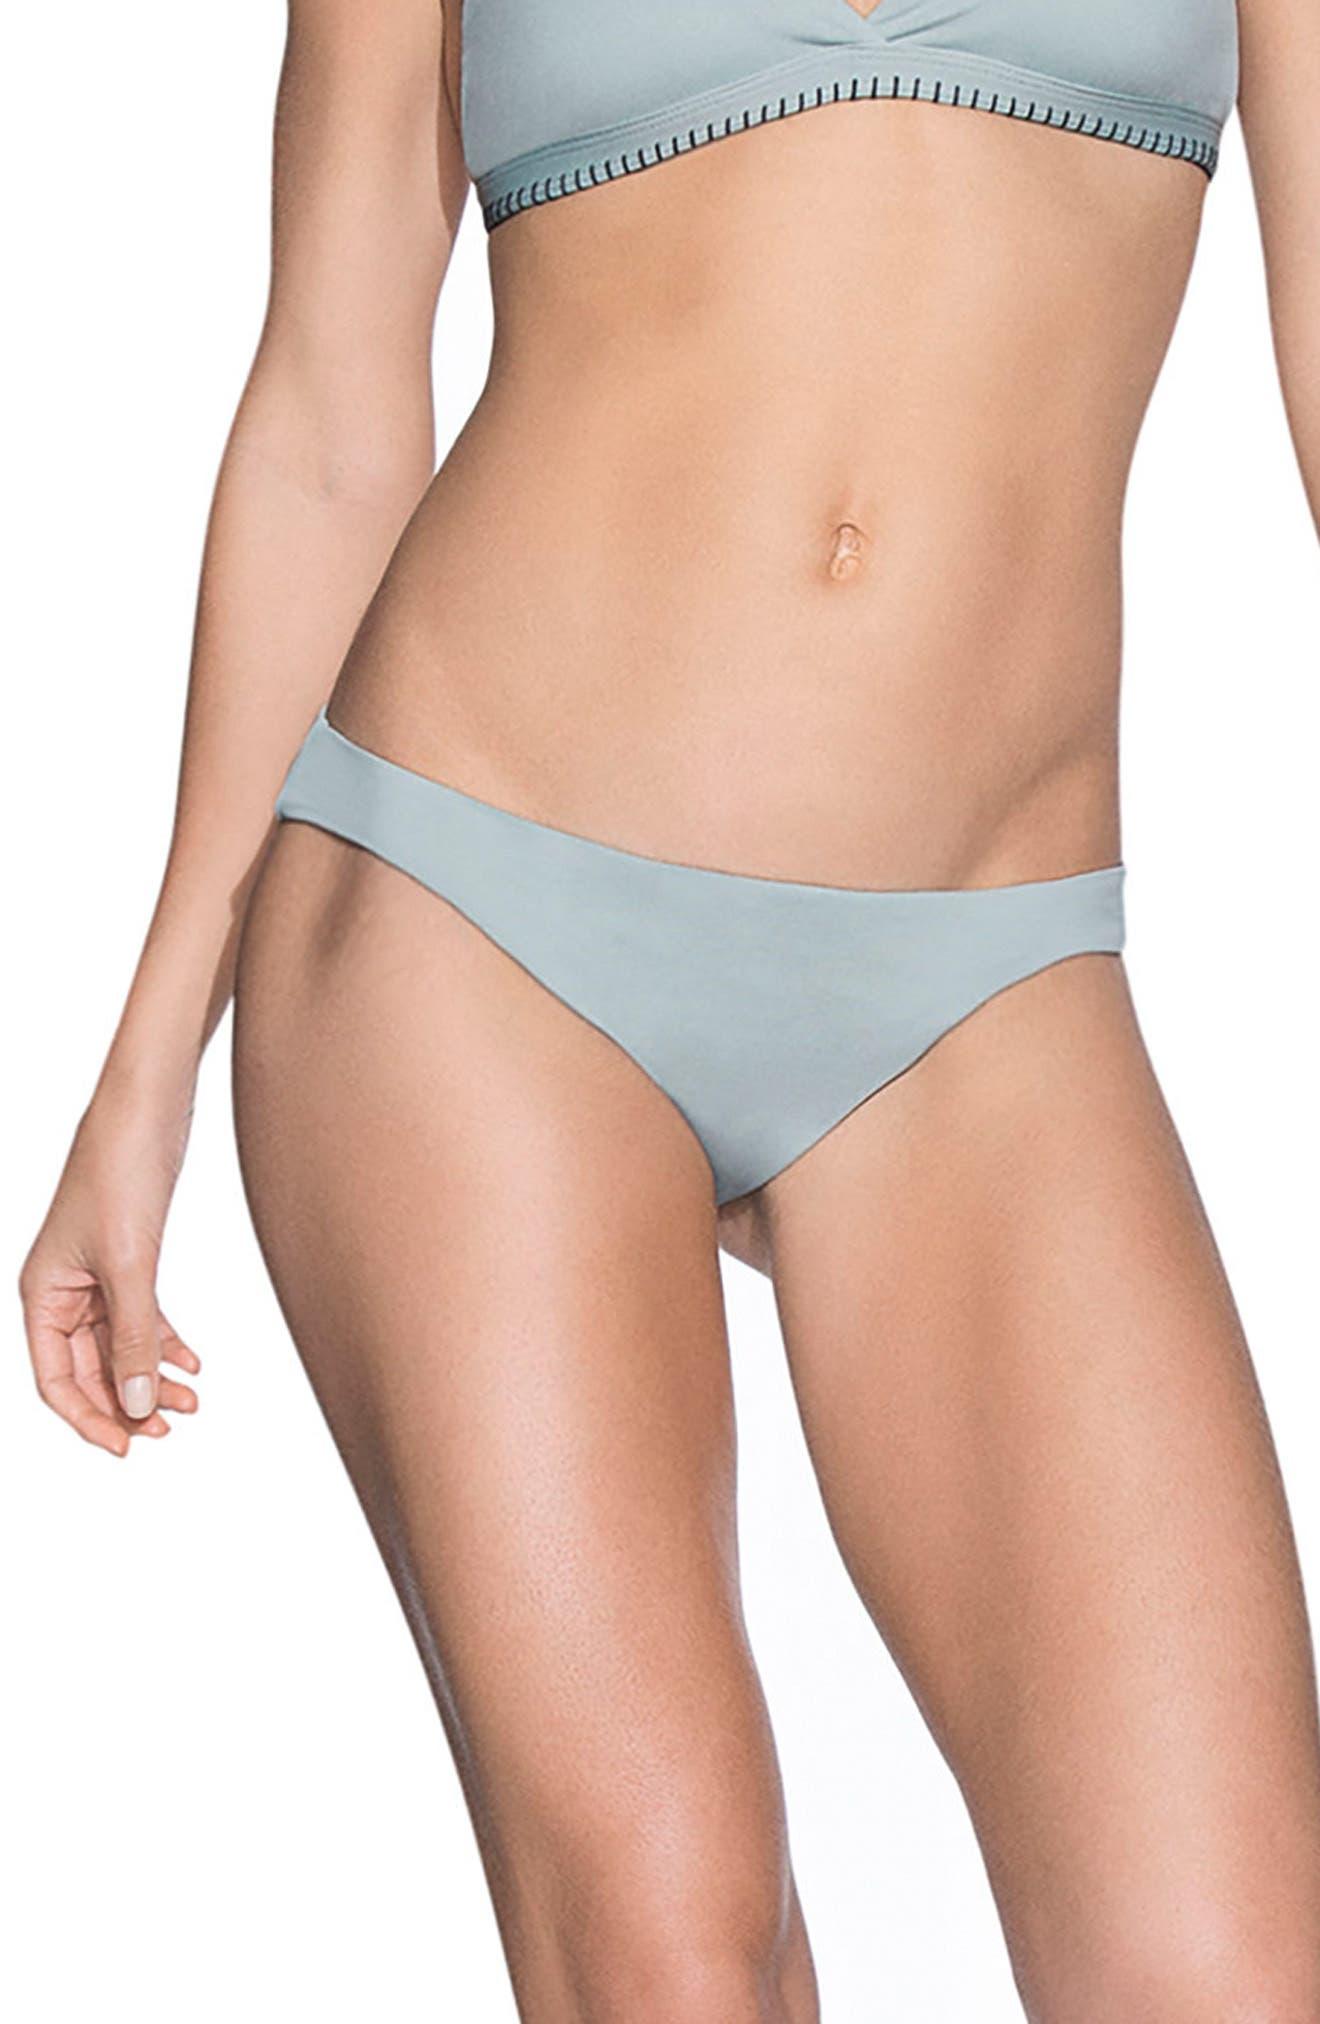 Lily Pad Flirt Signature Cut Reversible Bikini Bottoms,                             Main thumbnail 1, color,                             Open Green